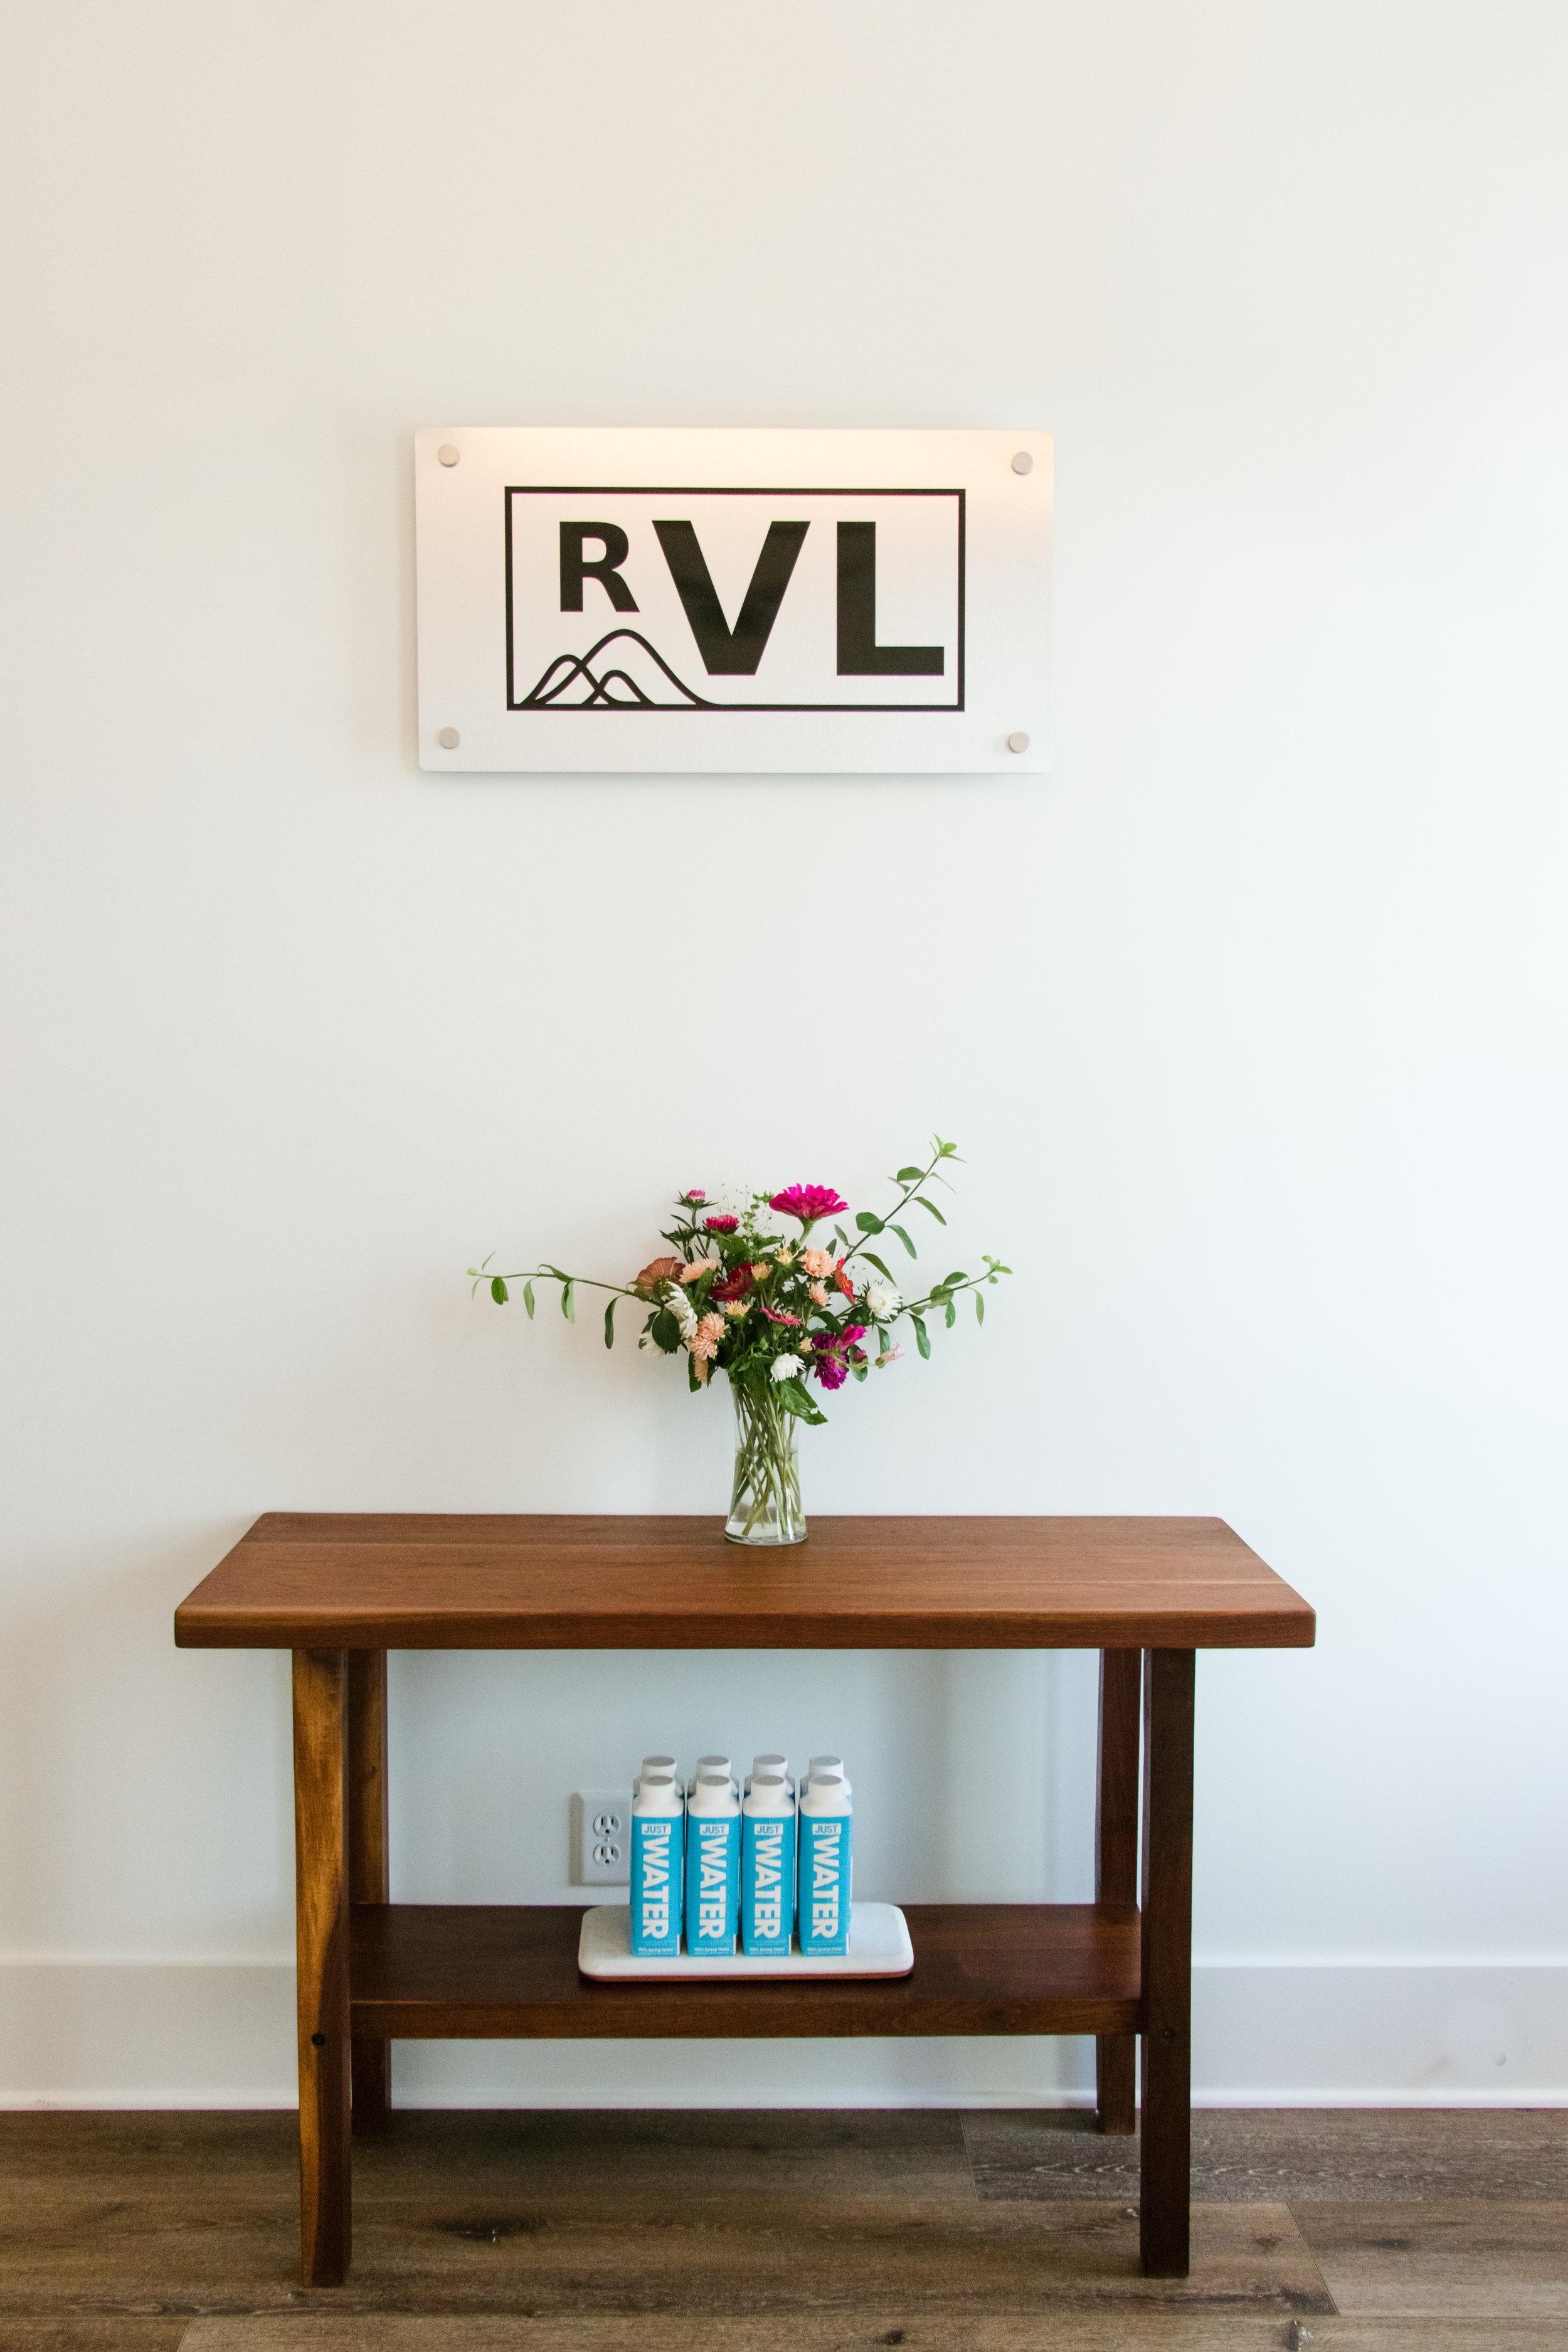 Rockridge Venture Law